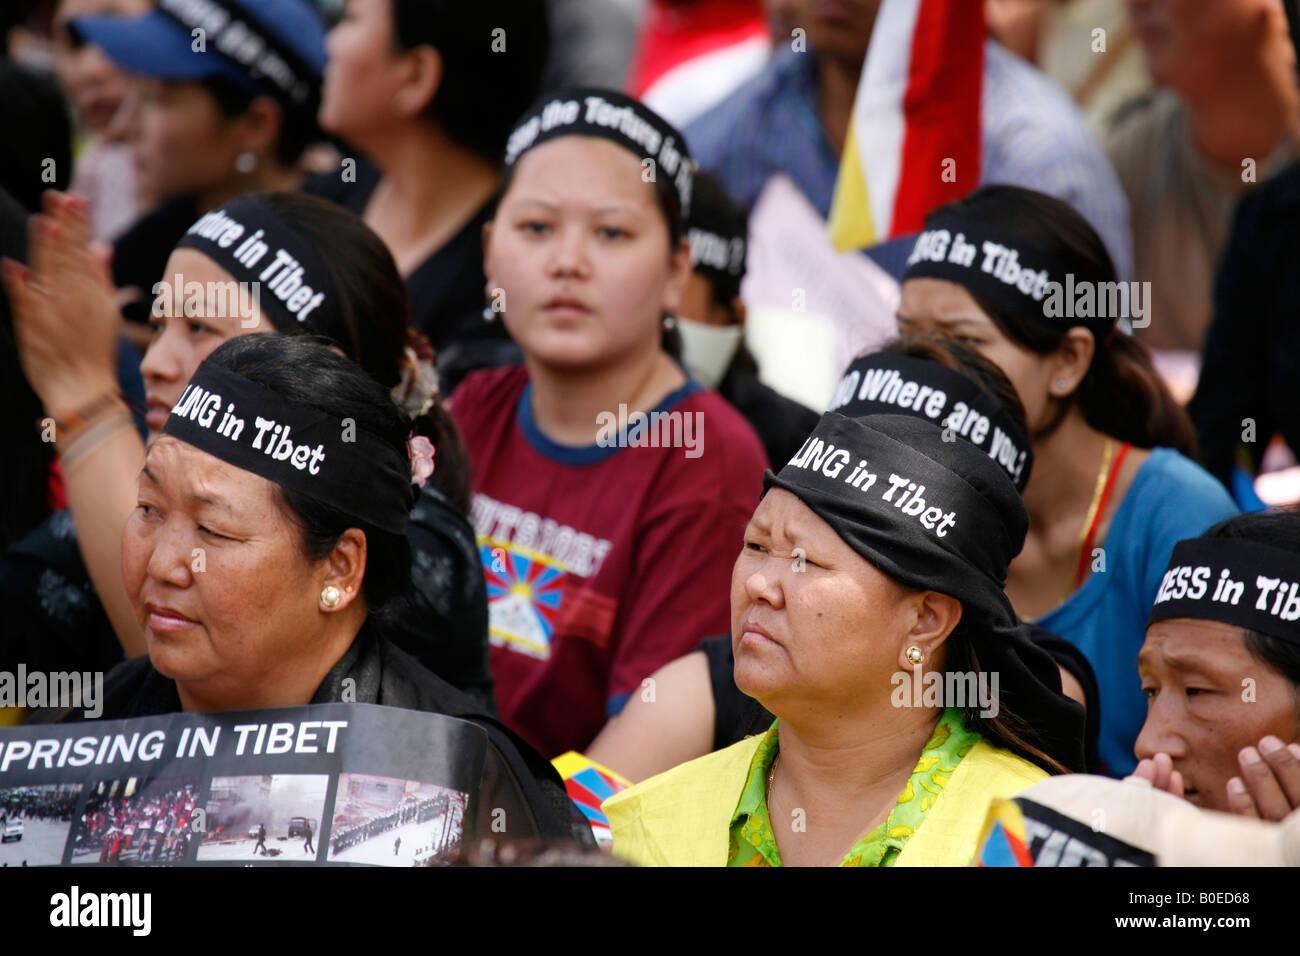 Women wera black headbands to mark Black Monday - Stock Image